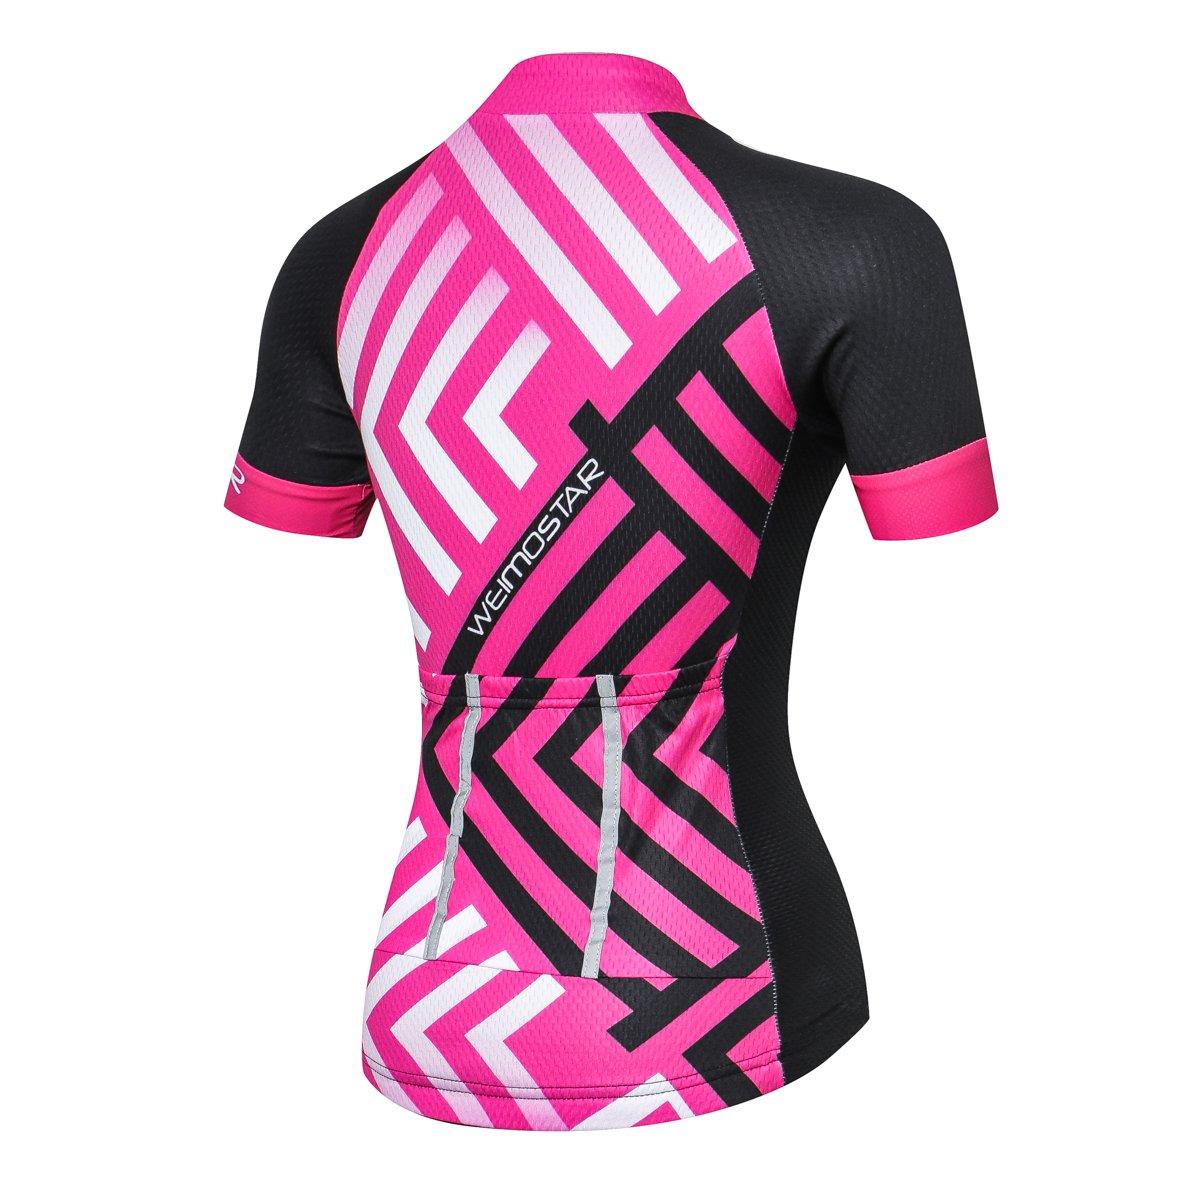 xingrass Womens Cycling Jerseys Short Sleeve Shirts Cycle Racing Shirt Shorts Bicycle Bike Girl Sportwear Clothing Breathable Quick Dry